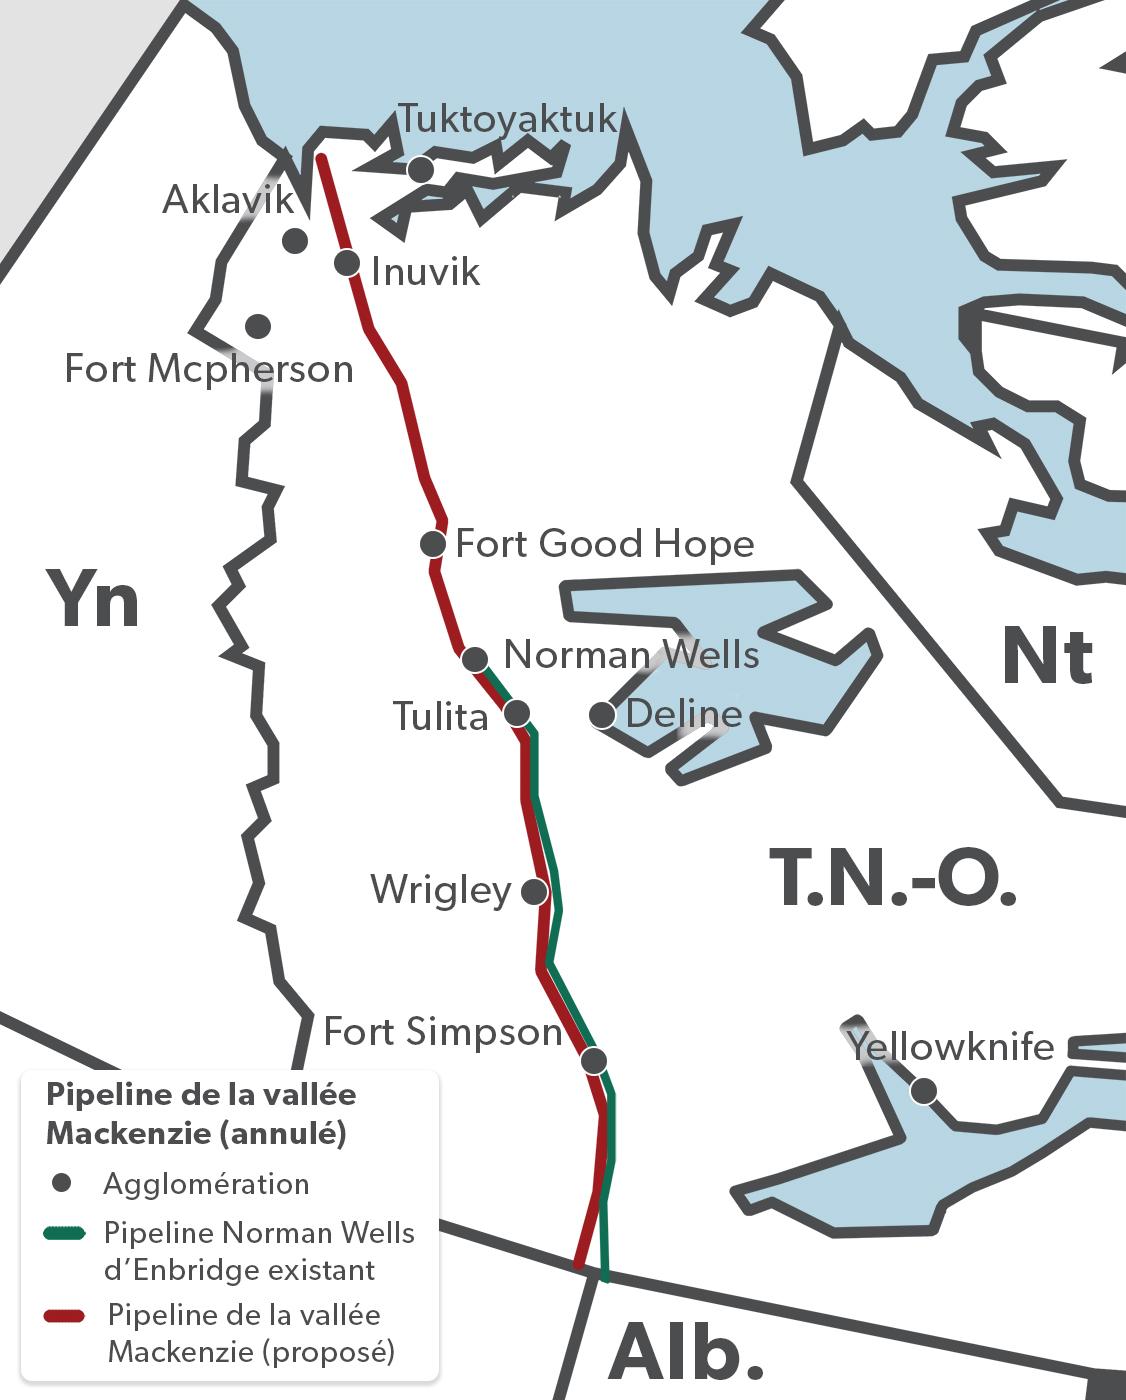 Pipeline de la vallée Mackenzie (partie du Projet gazier Mackenzie annulé)